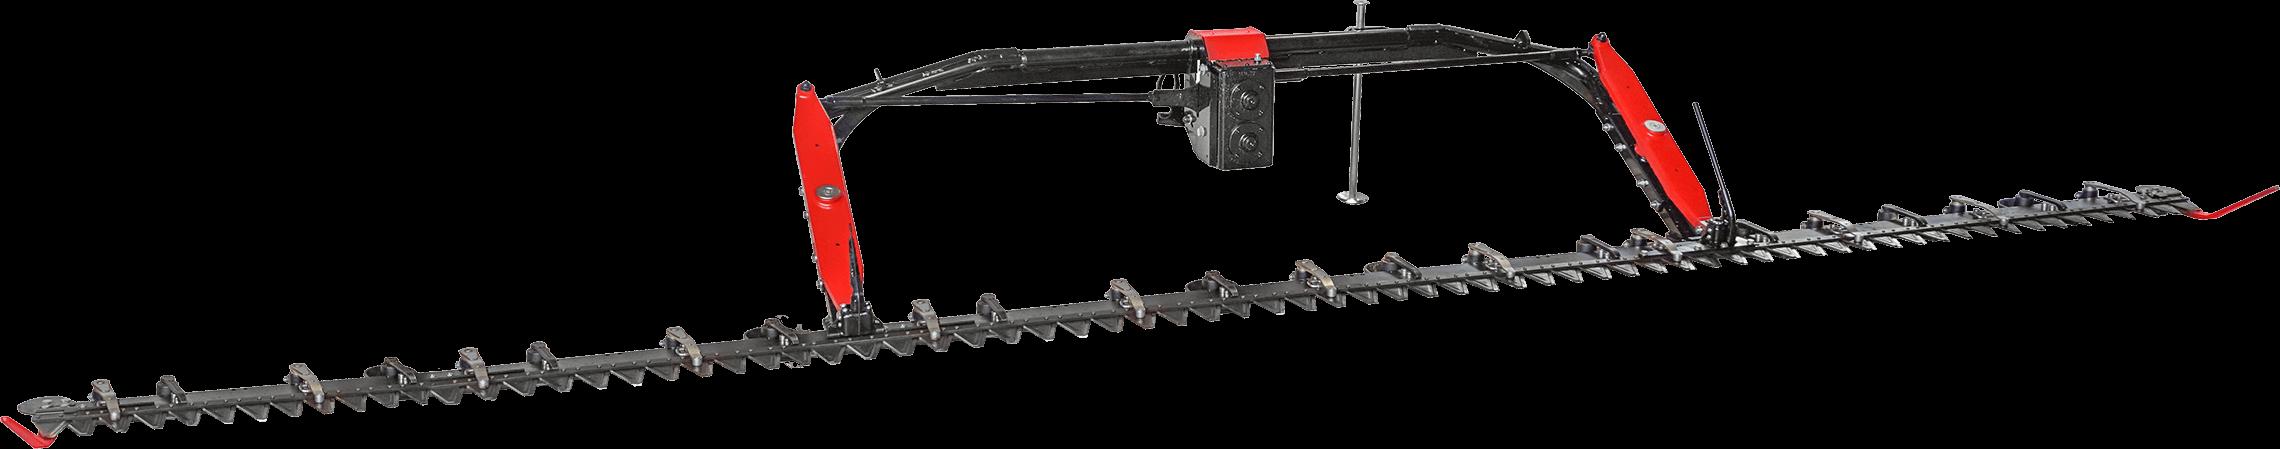 Köppl Spezial Doppelmesser-Portalmähwerk